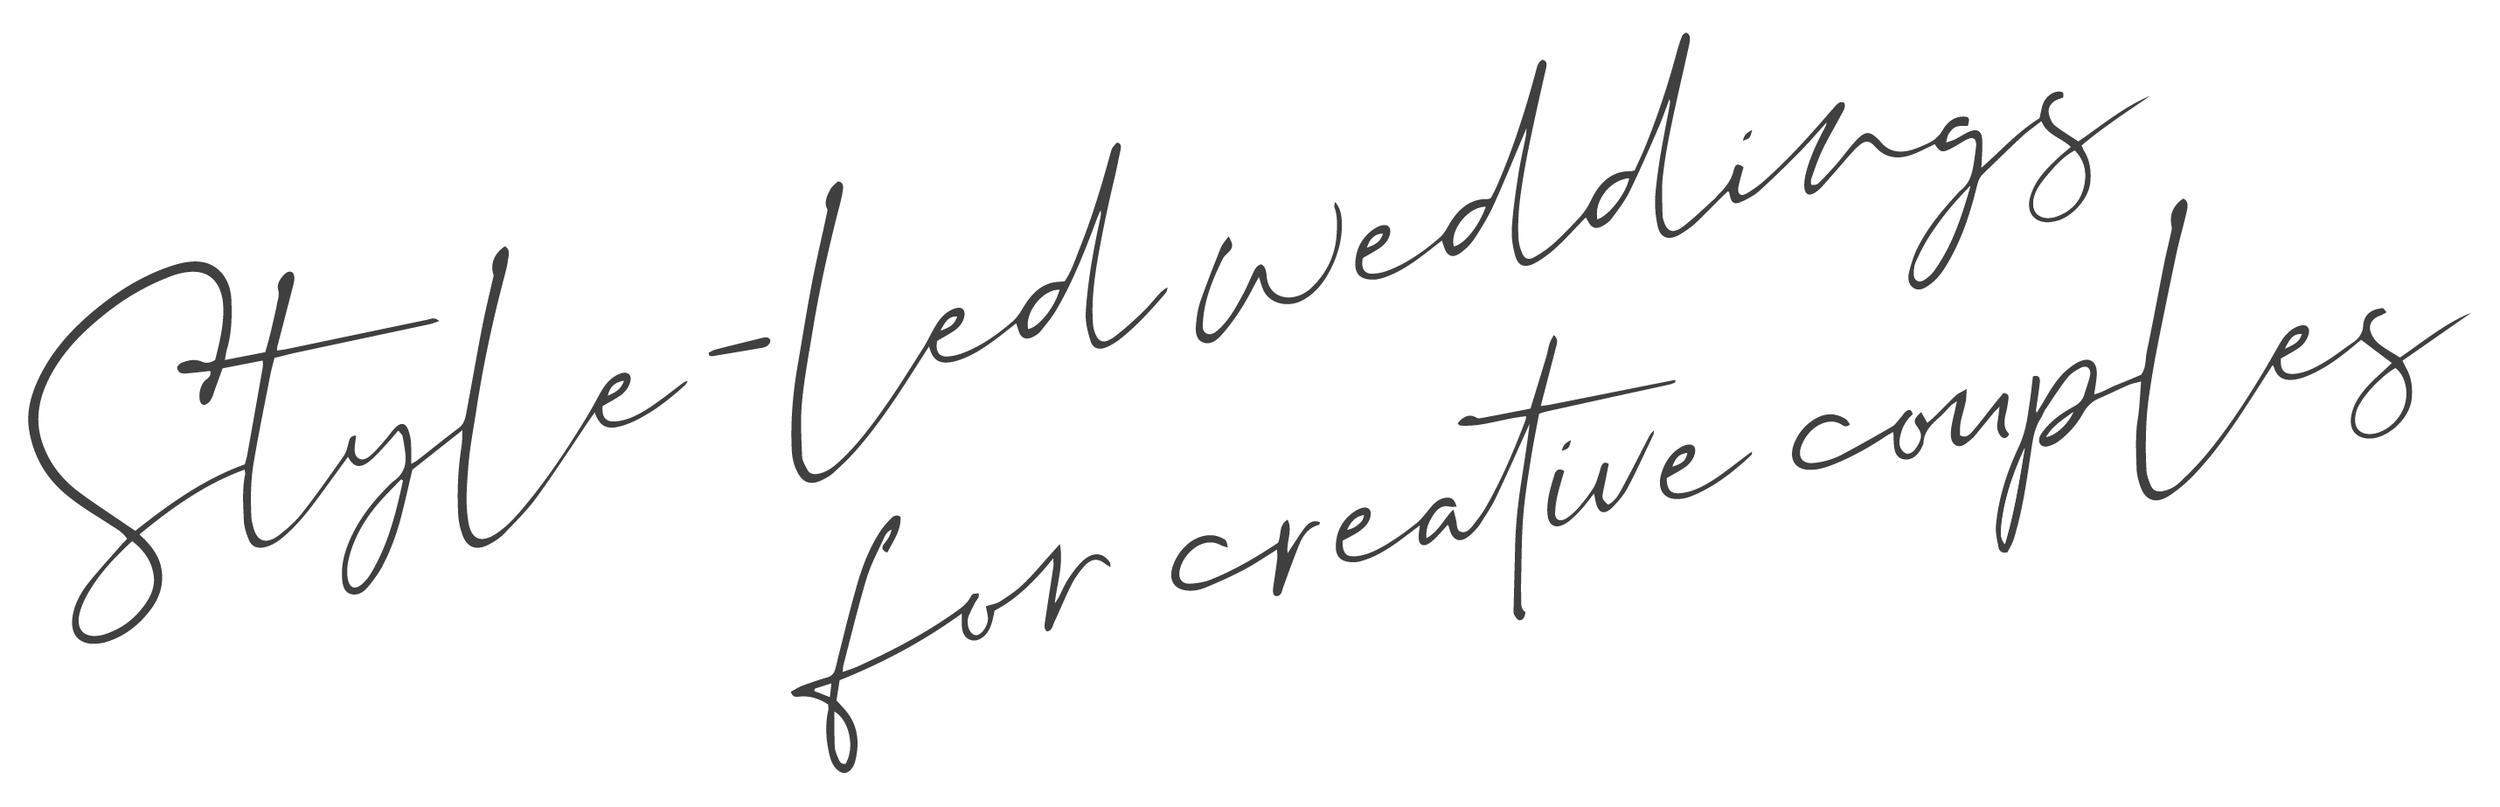 JN-website-design-elements-style-led-weddings-41.png